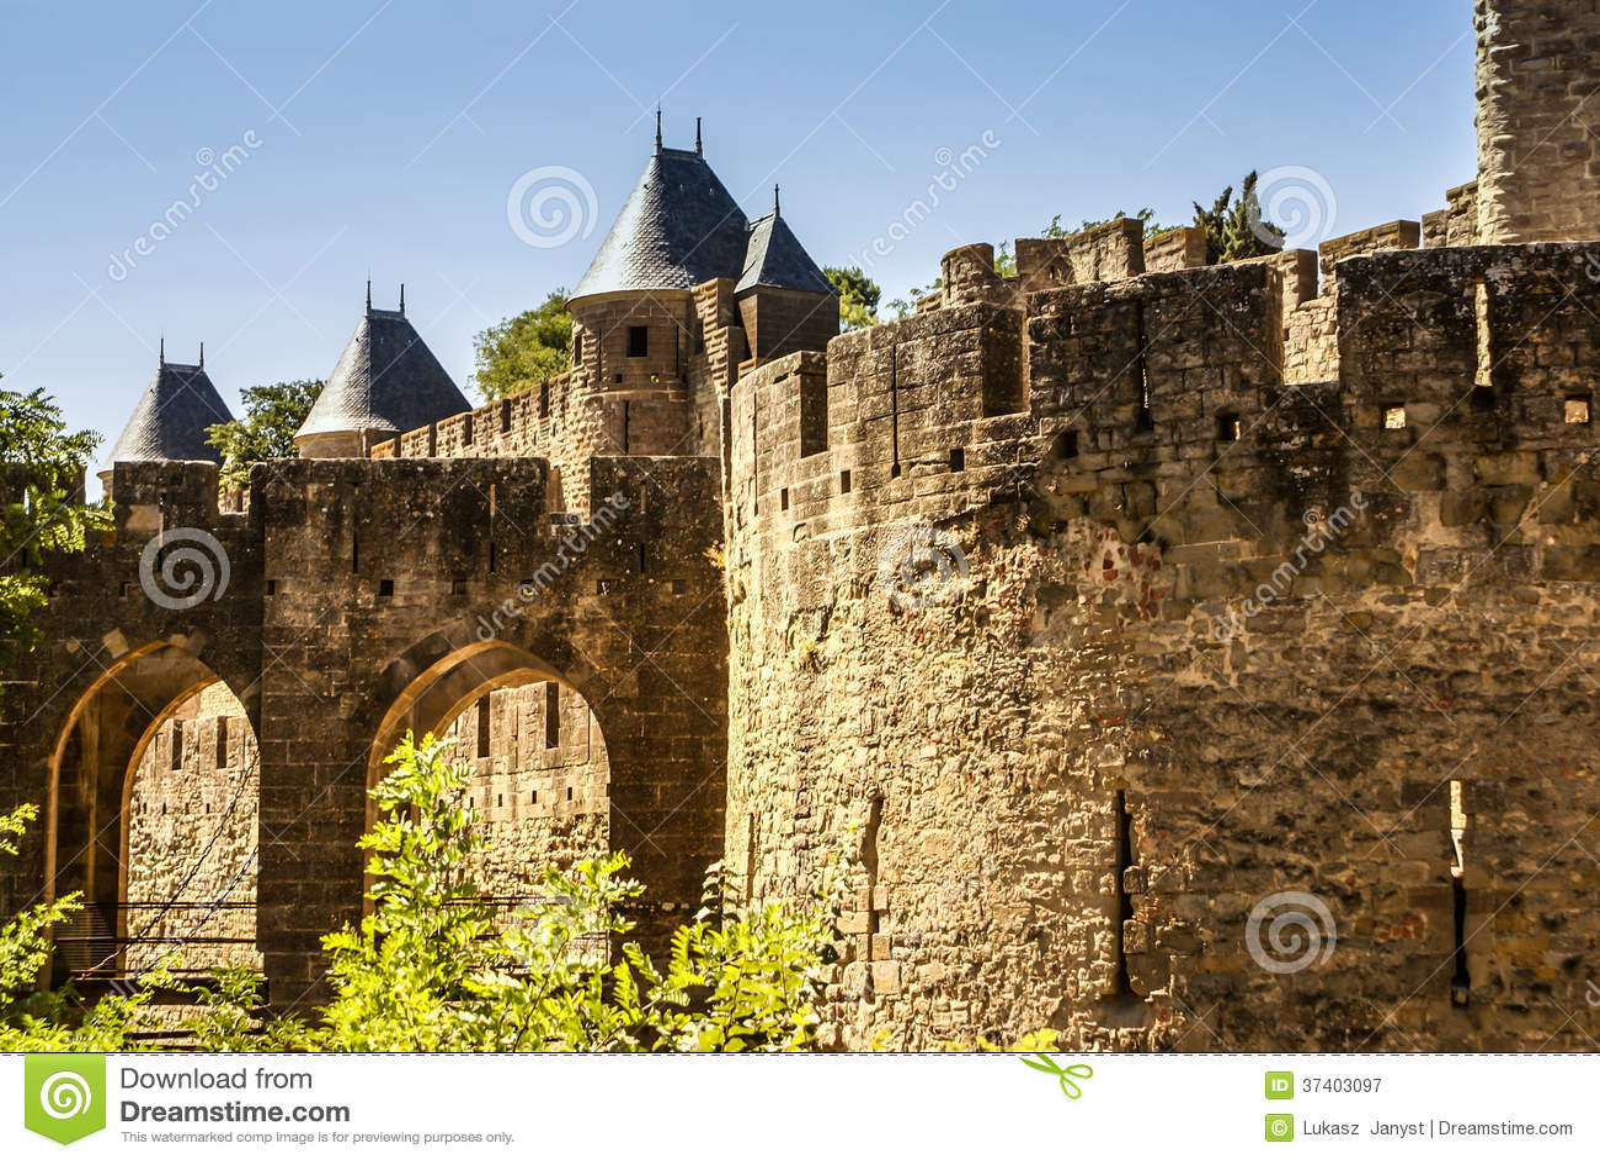 Pareti Esterne Illuminate : Pareti esterne di porte narbonnaise a carcassonne in francia